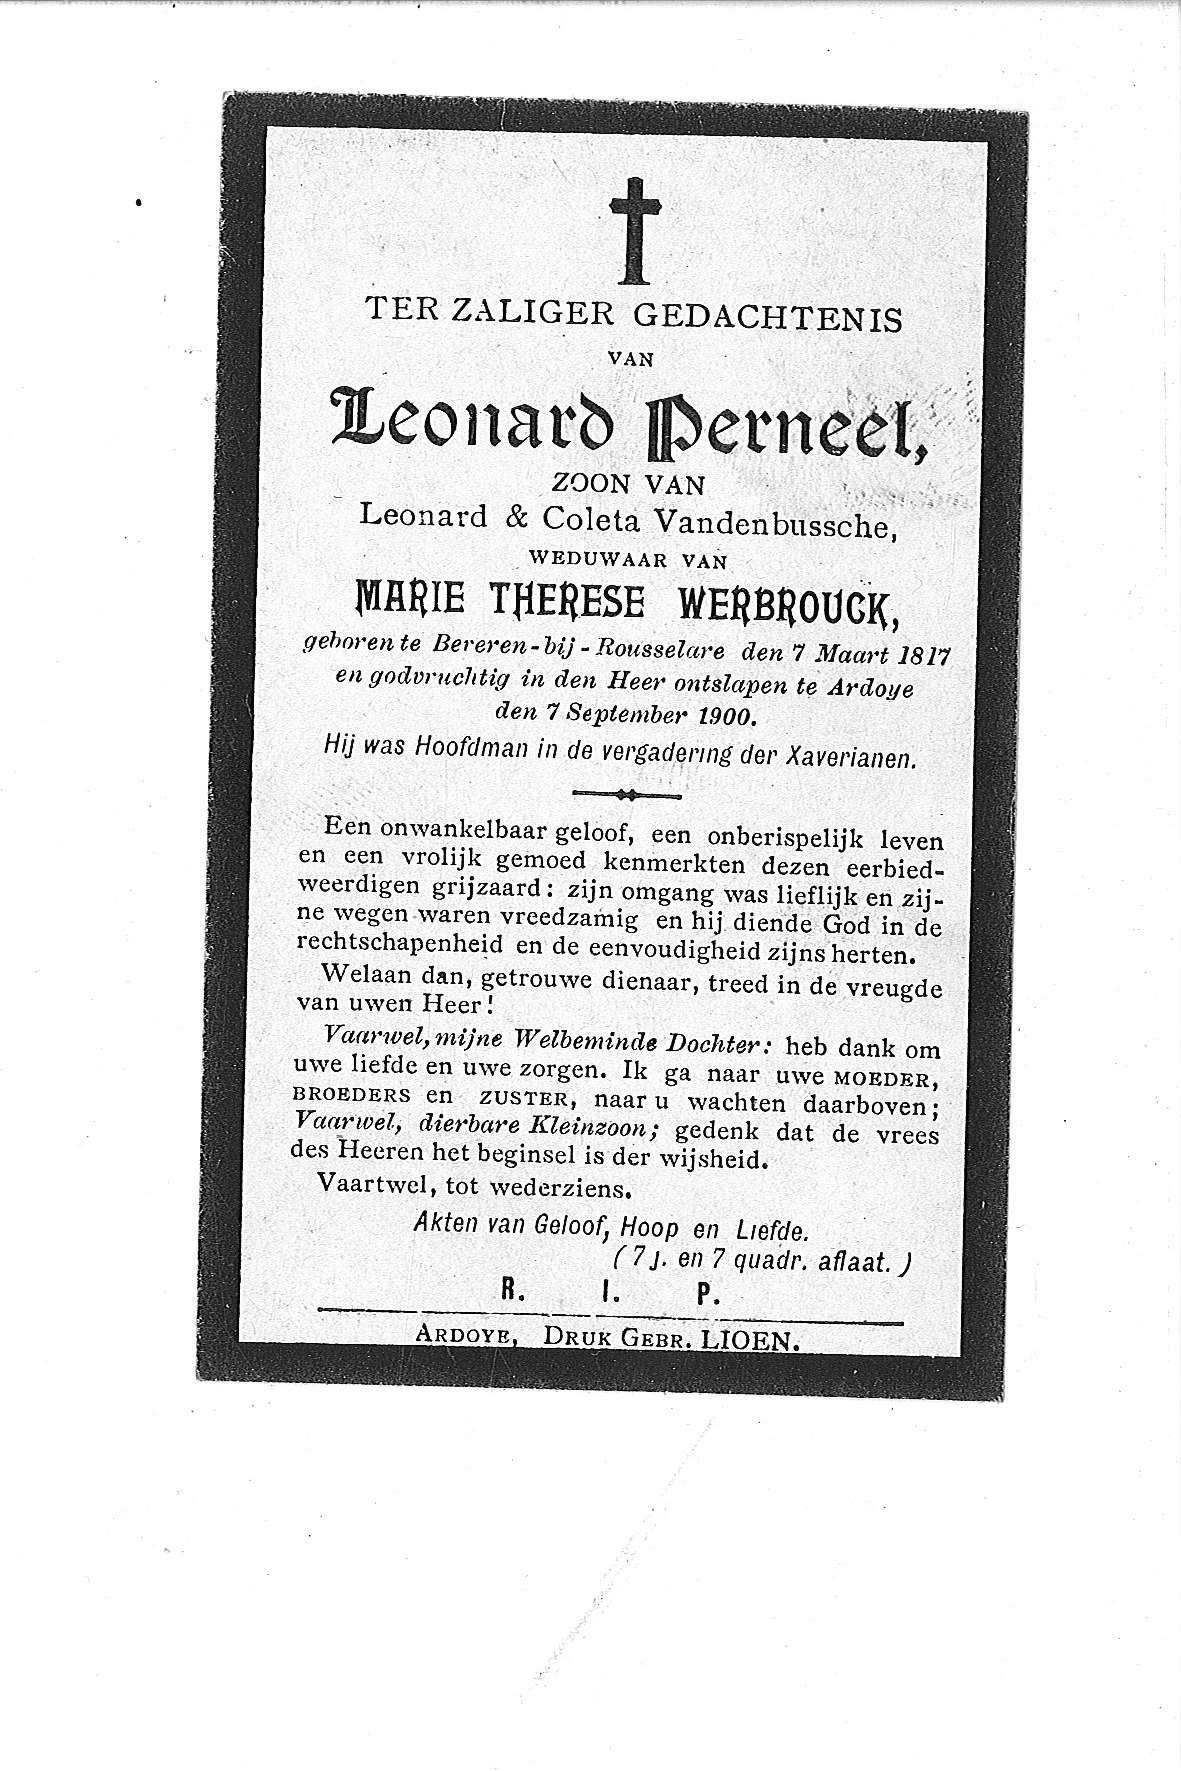 Leonard(1900)20100407141842_00017.jpg